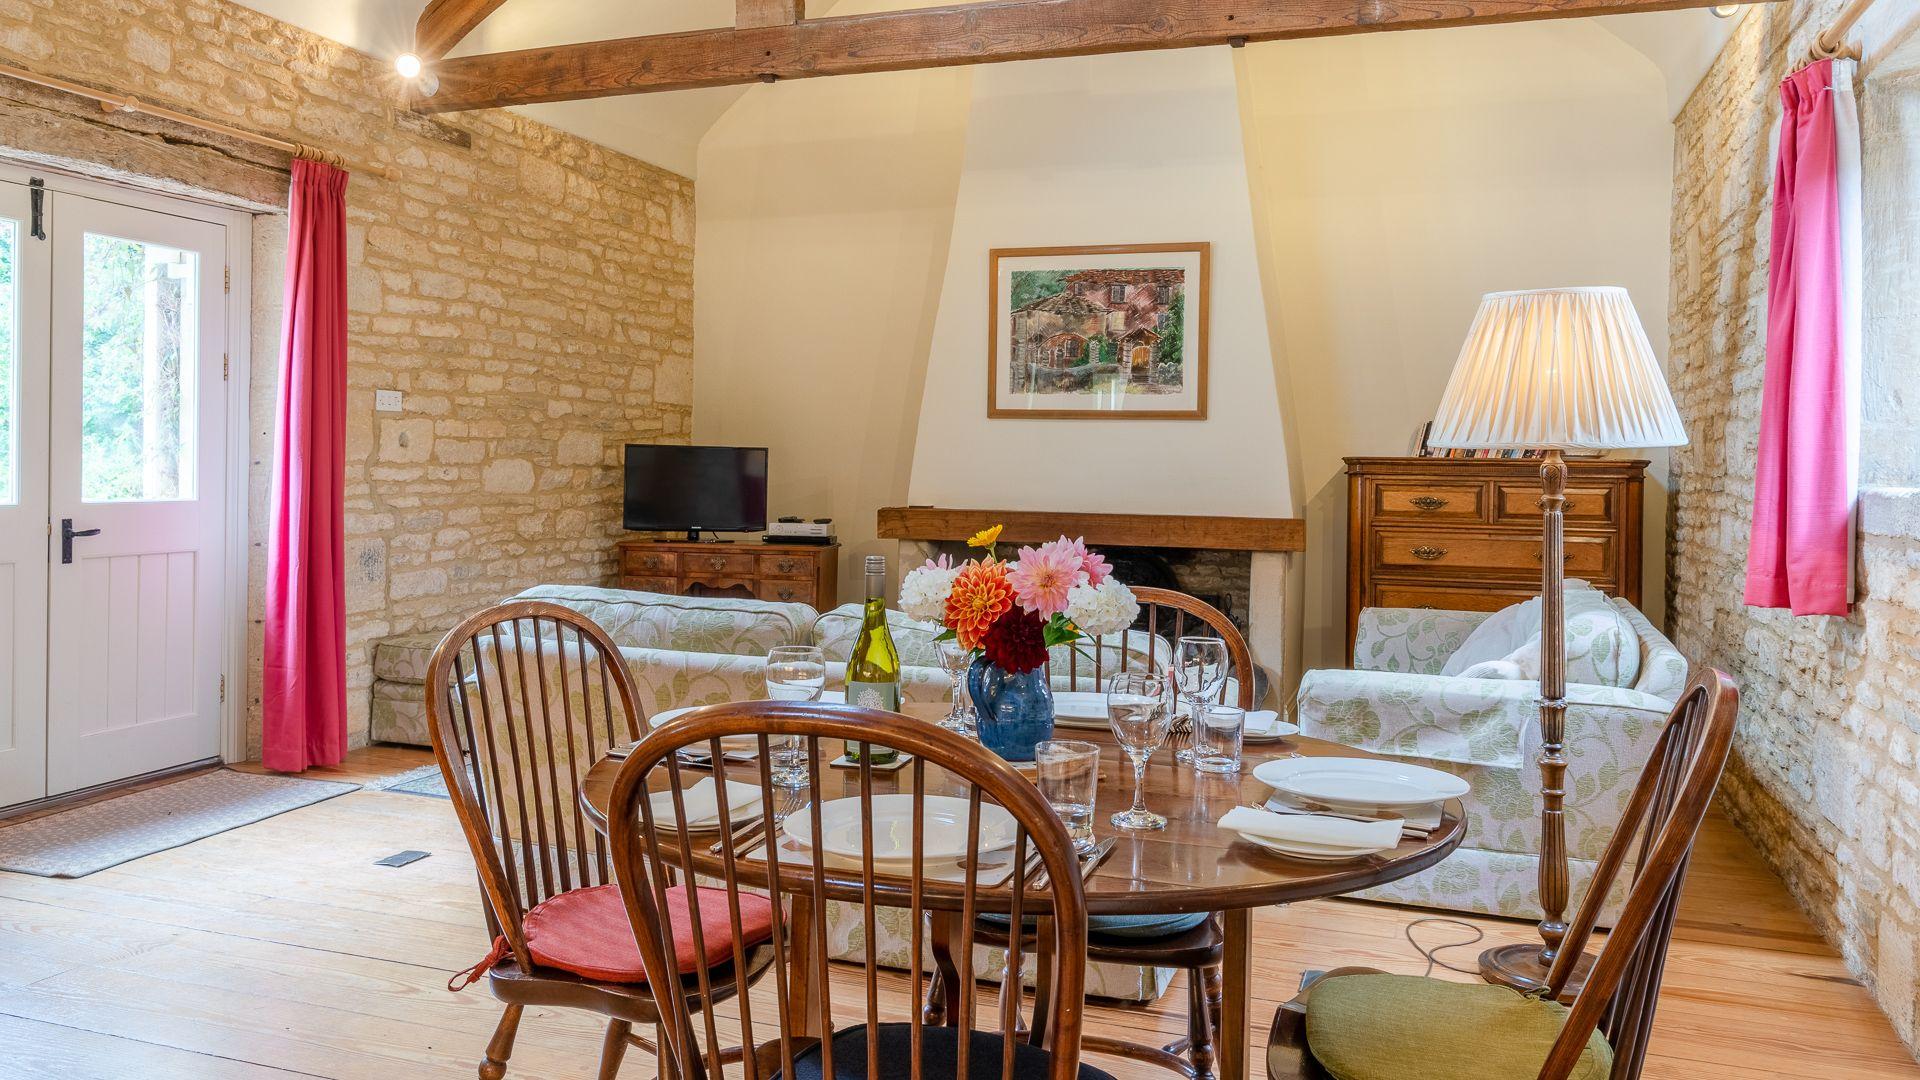 Dining-living area, Aylworth Manor Granary, Bolthole Retreats